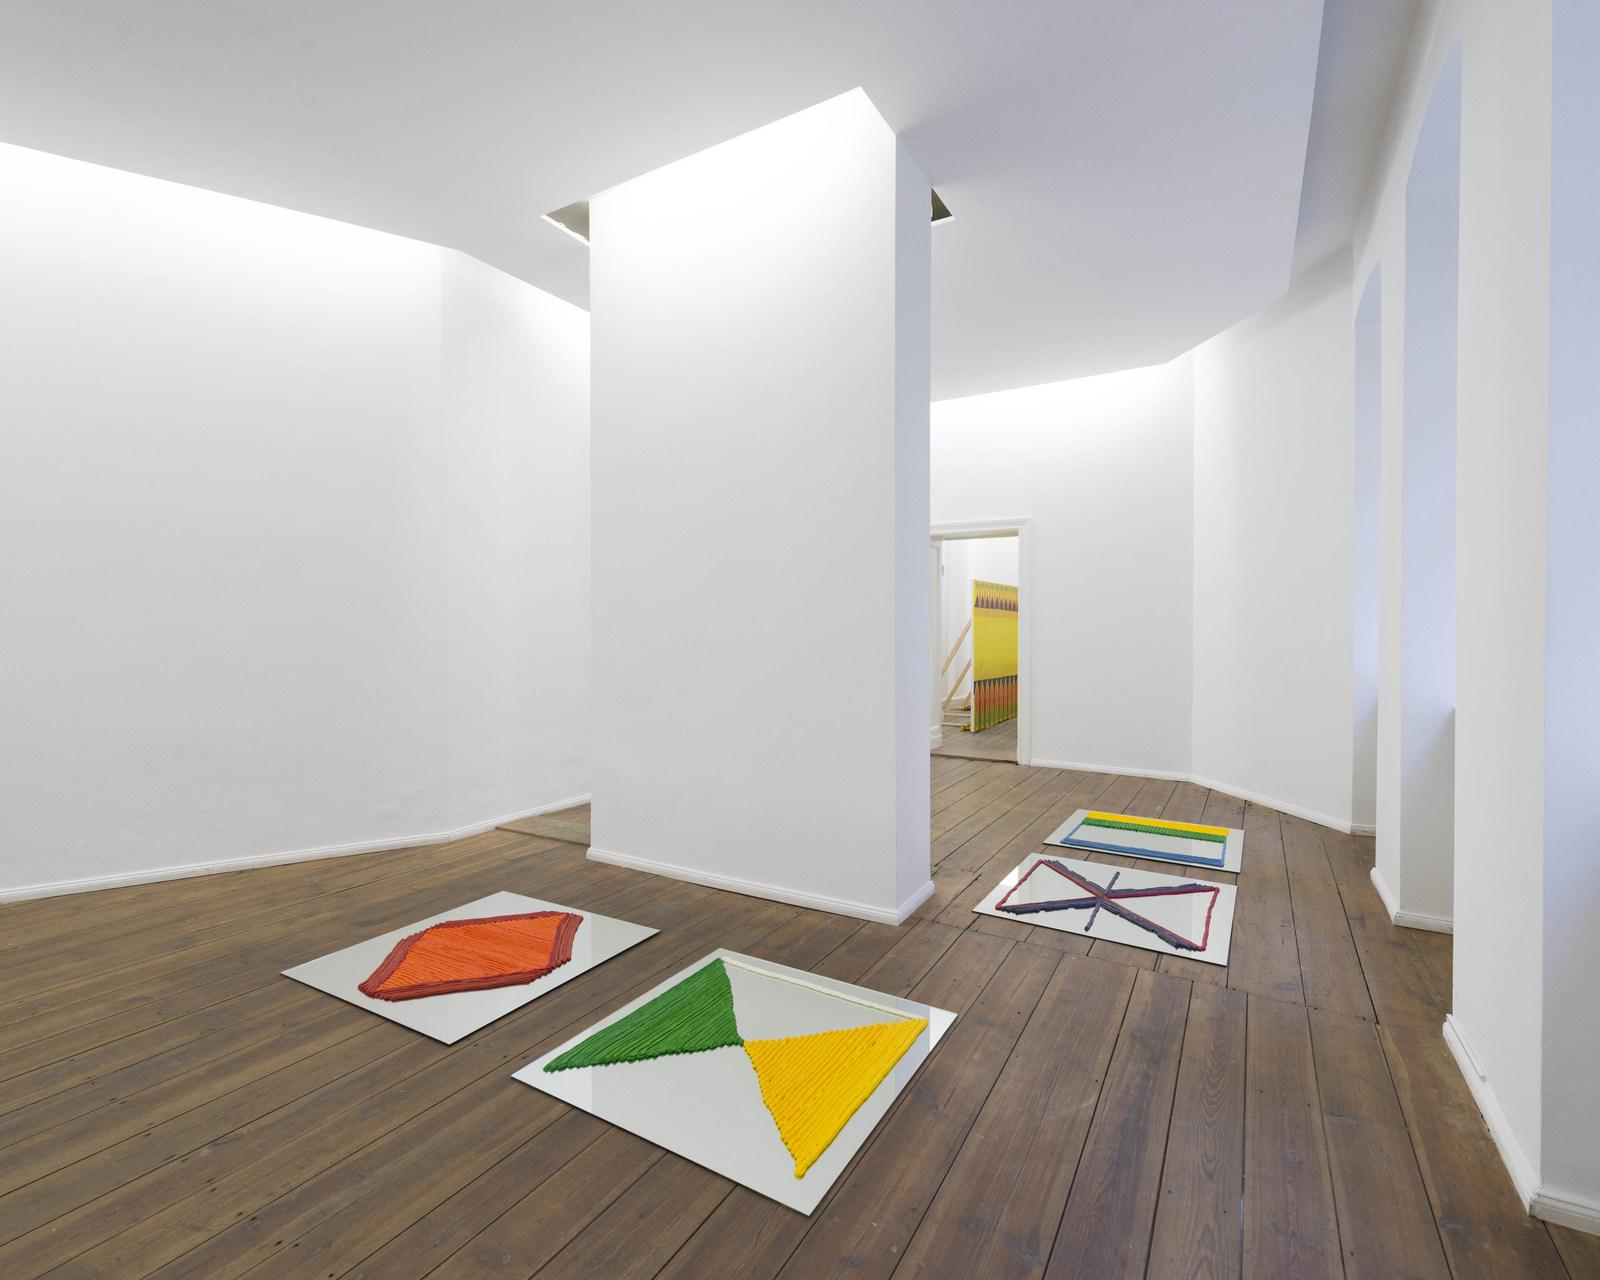 TGood TSJO¦êRBERG artdoc Grimmuseum 27 02 2015 _0085